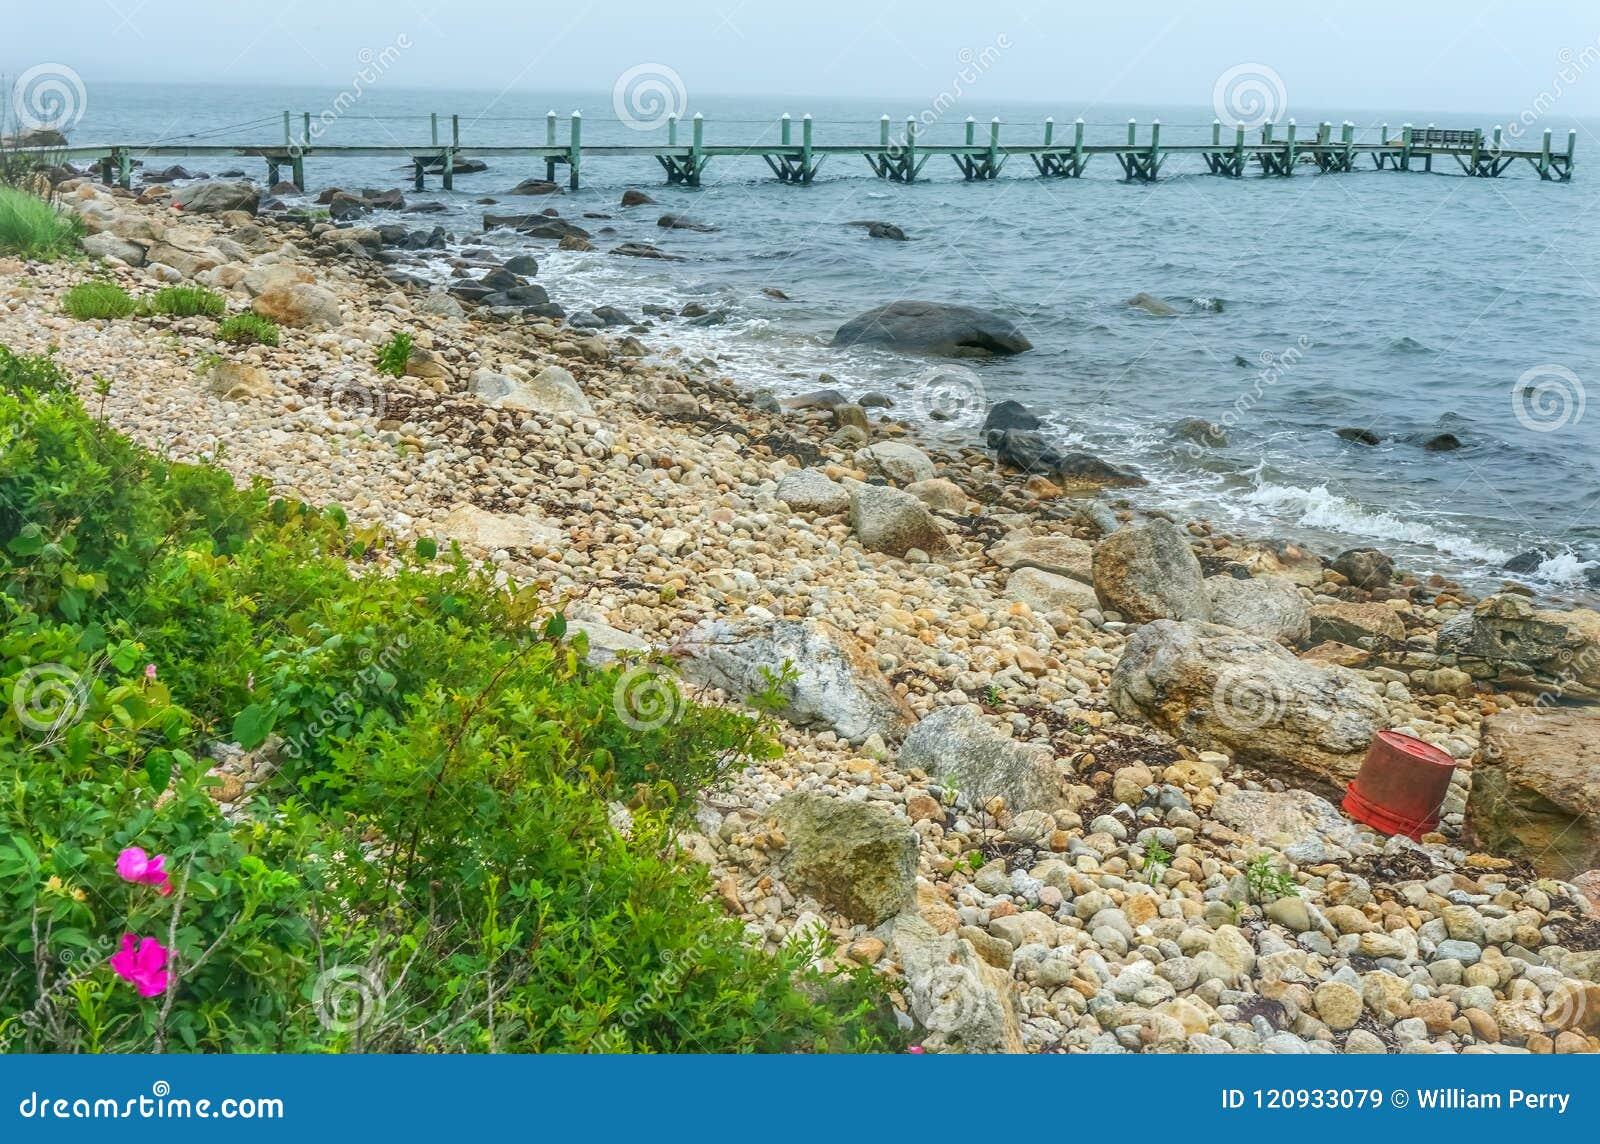 Plage pierreuse Pier Piink Roses Padnaram Dartmouth mA de matin brumeux